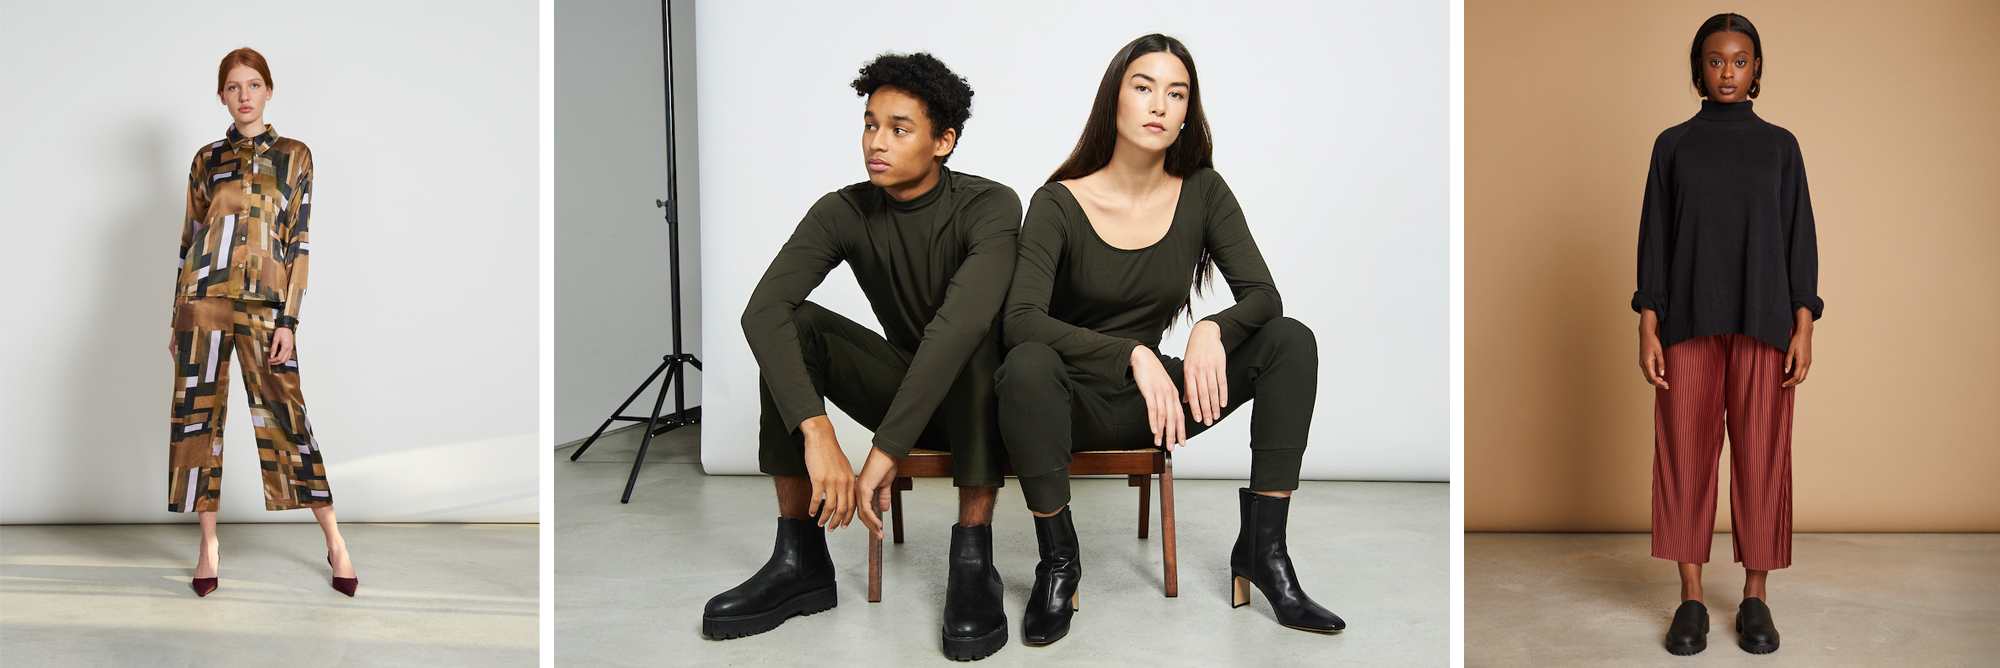 JAN 'N JUNE – nachhaltige, bezahlbare High Fashion